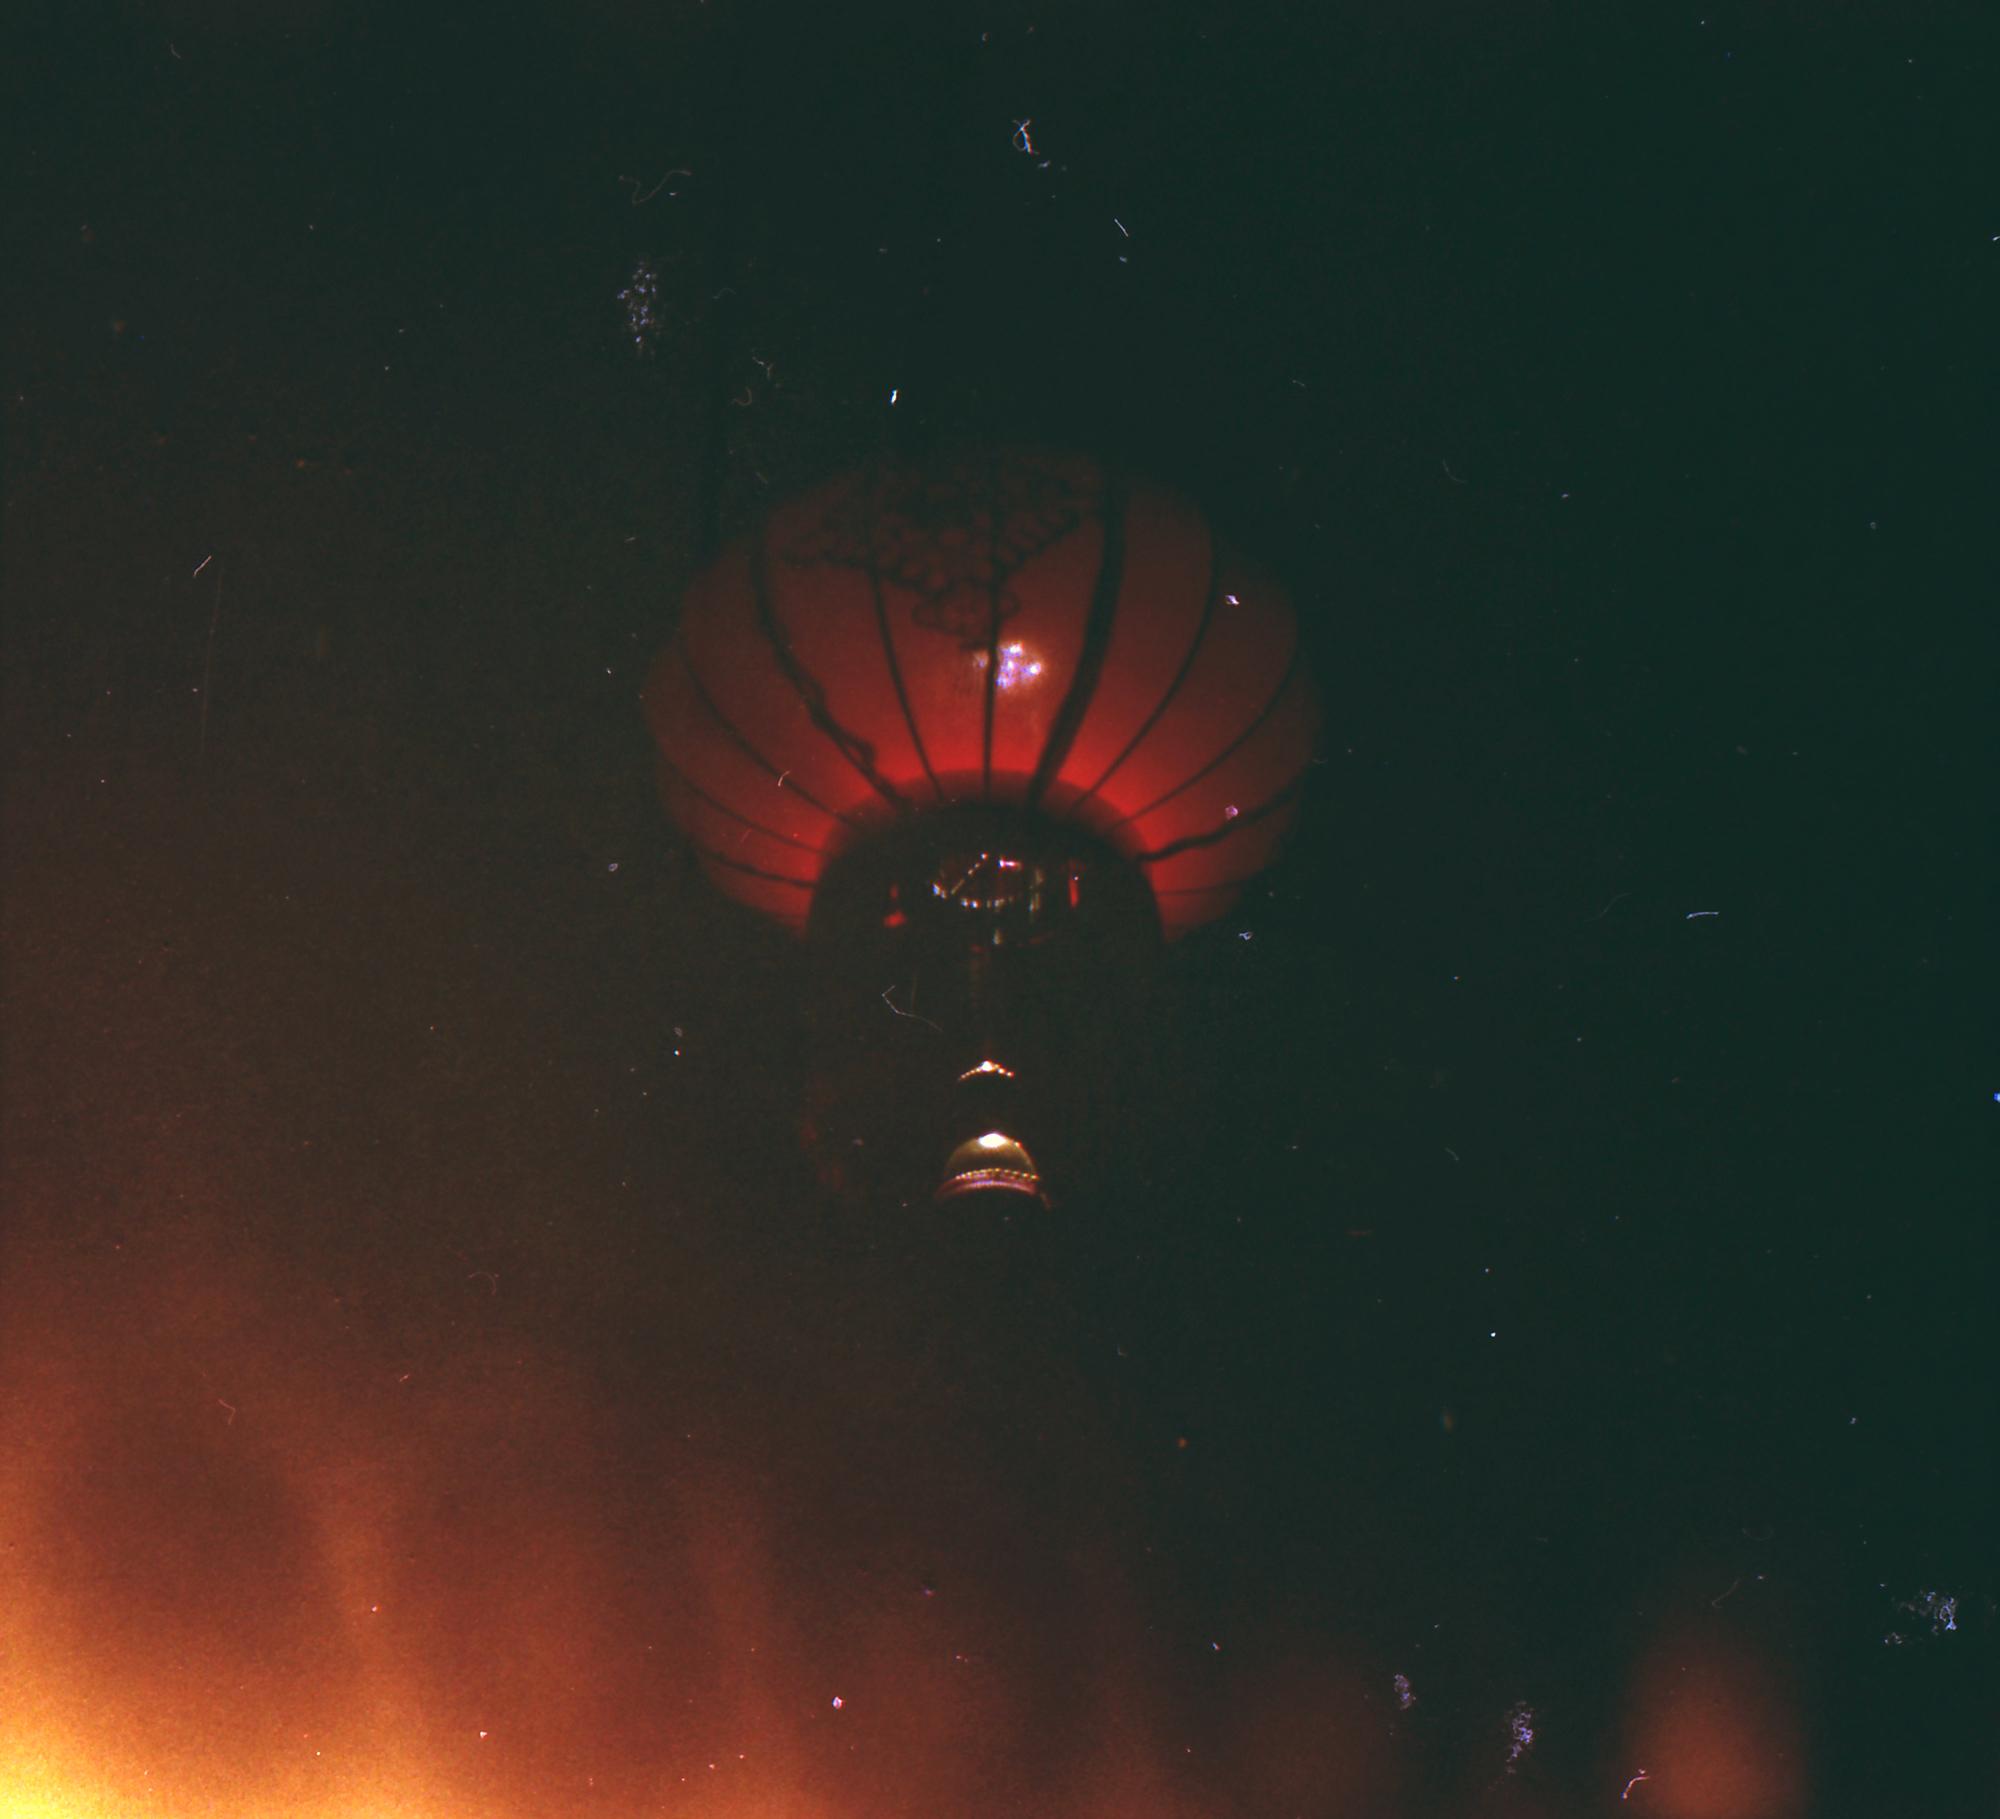 Étoile rouge - 35mm - Diana Mini - Fujifilm Superia 400